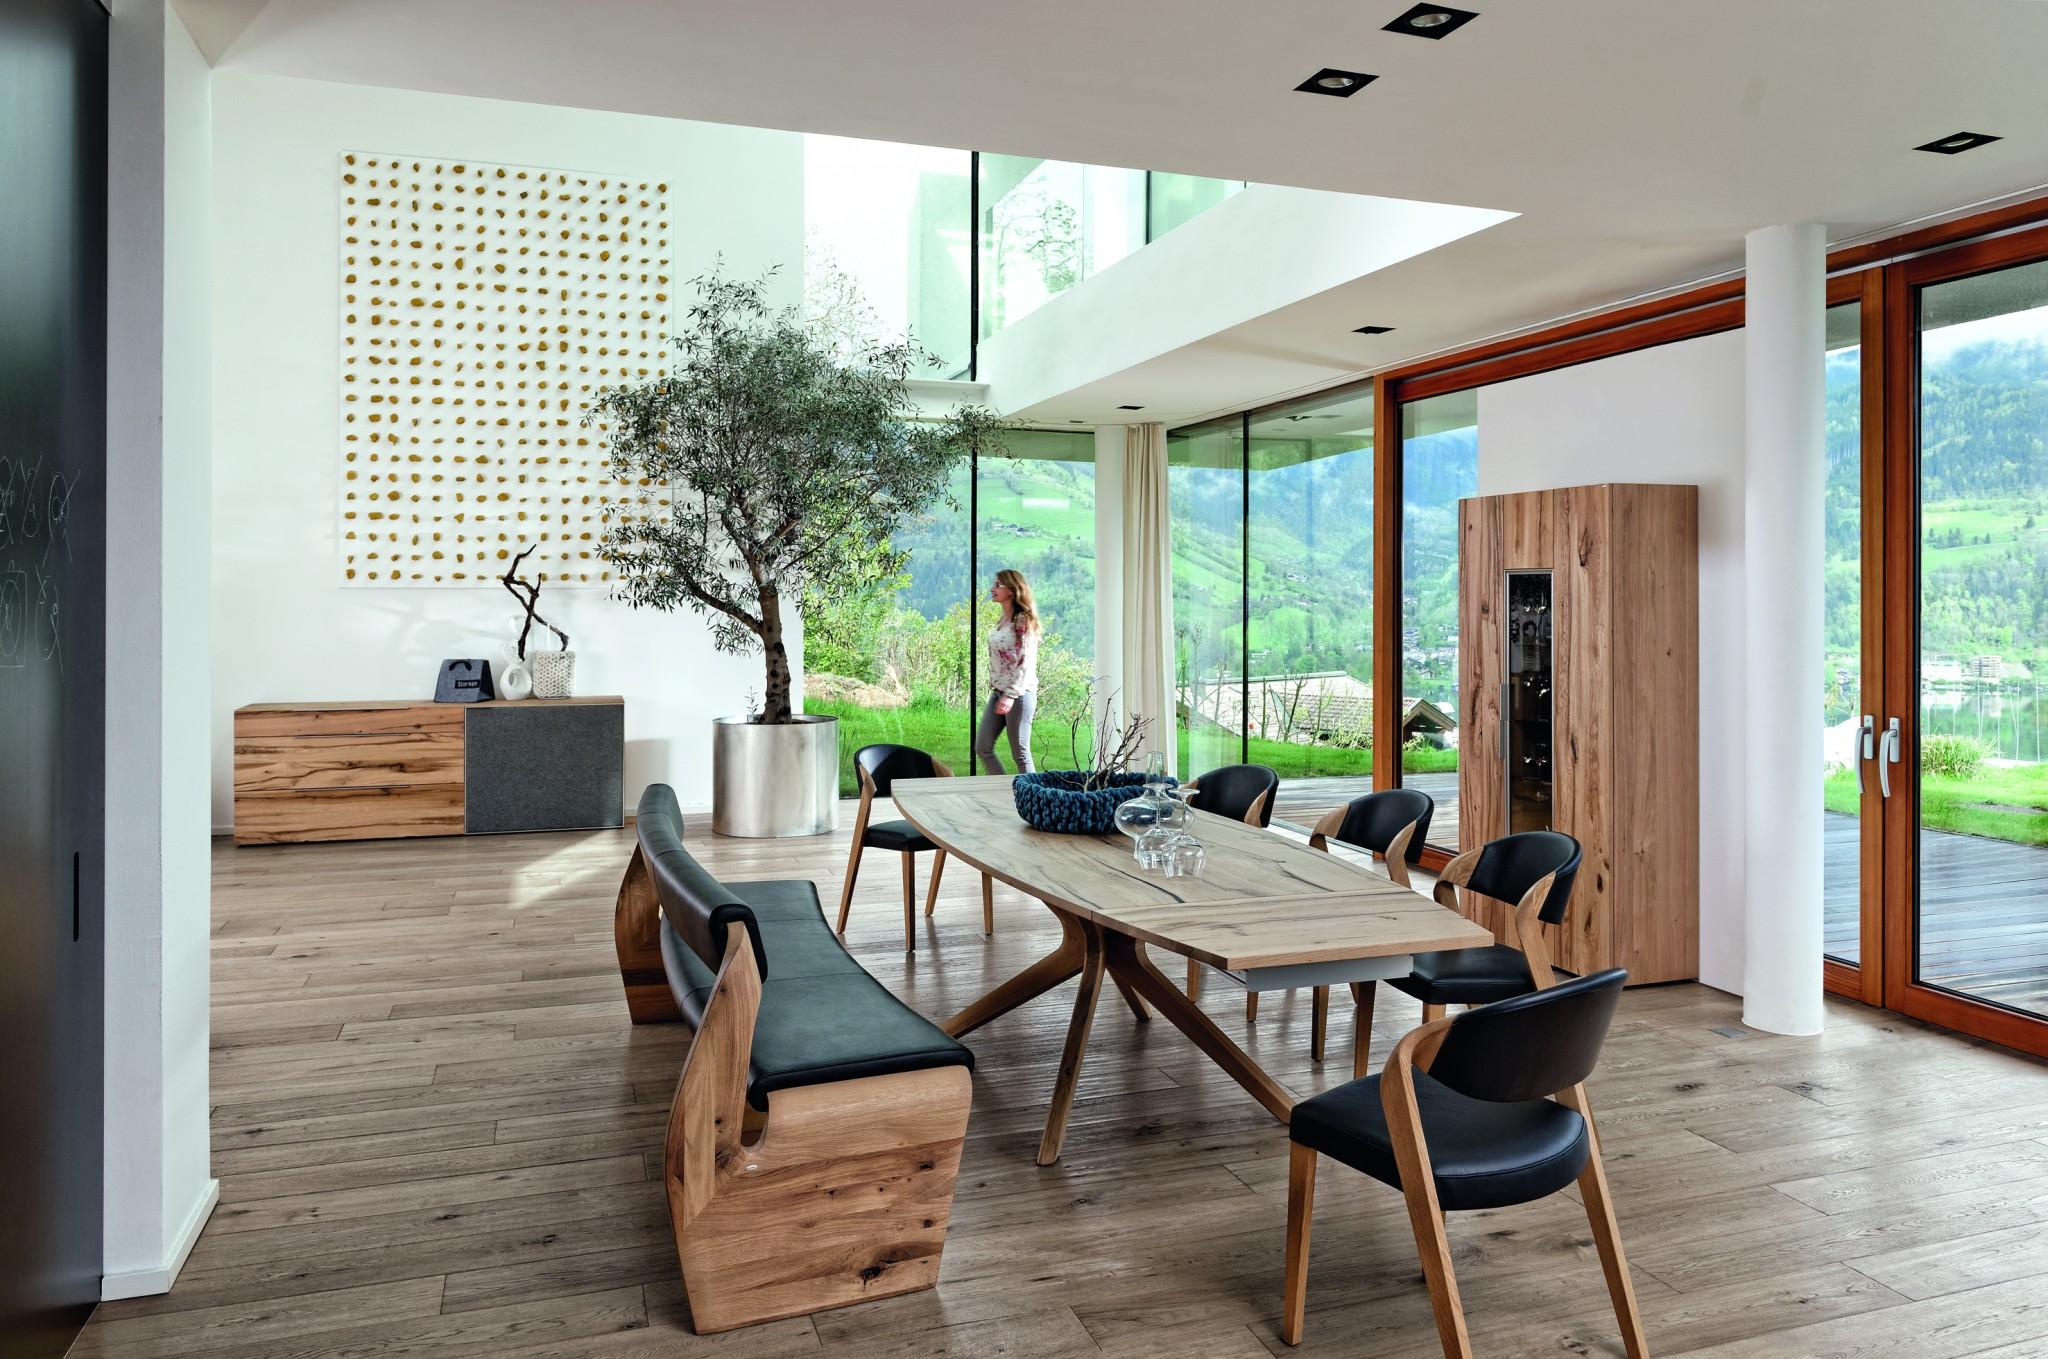 stuhl v alpin auf eiche altholz ge lt von voglauer mit lederbezug 298 m bel polt m belhaus. Black Bedroom Furniture Sets. Home Design Ideas